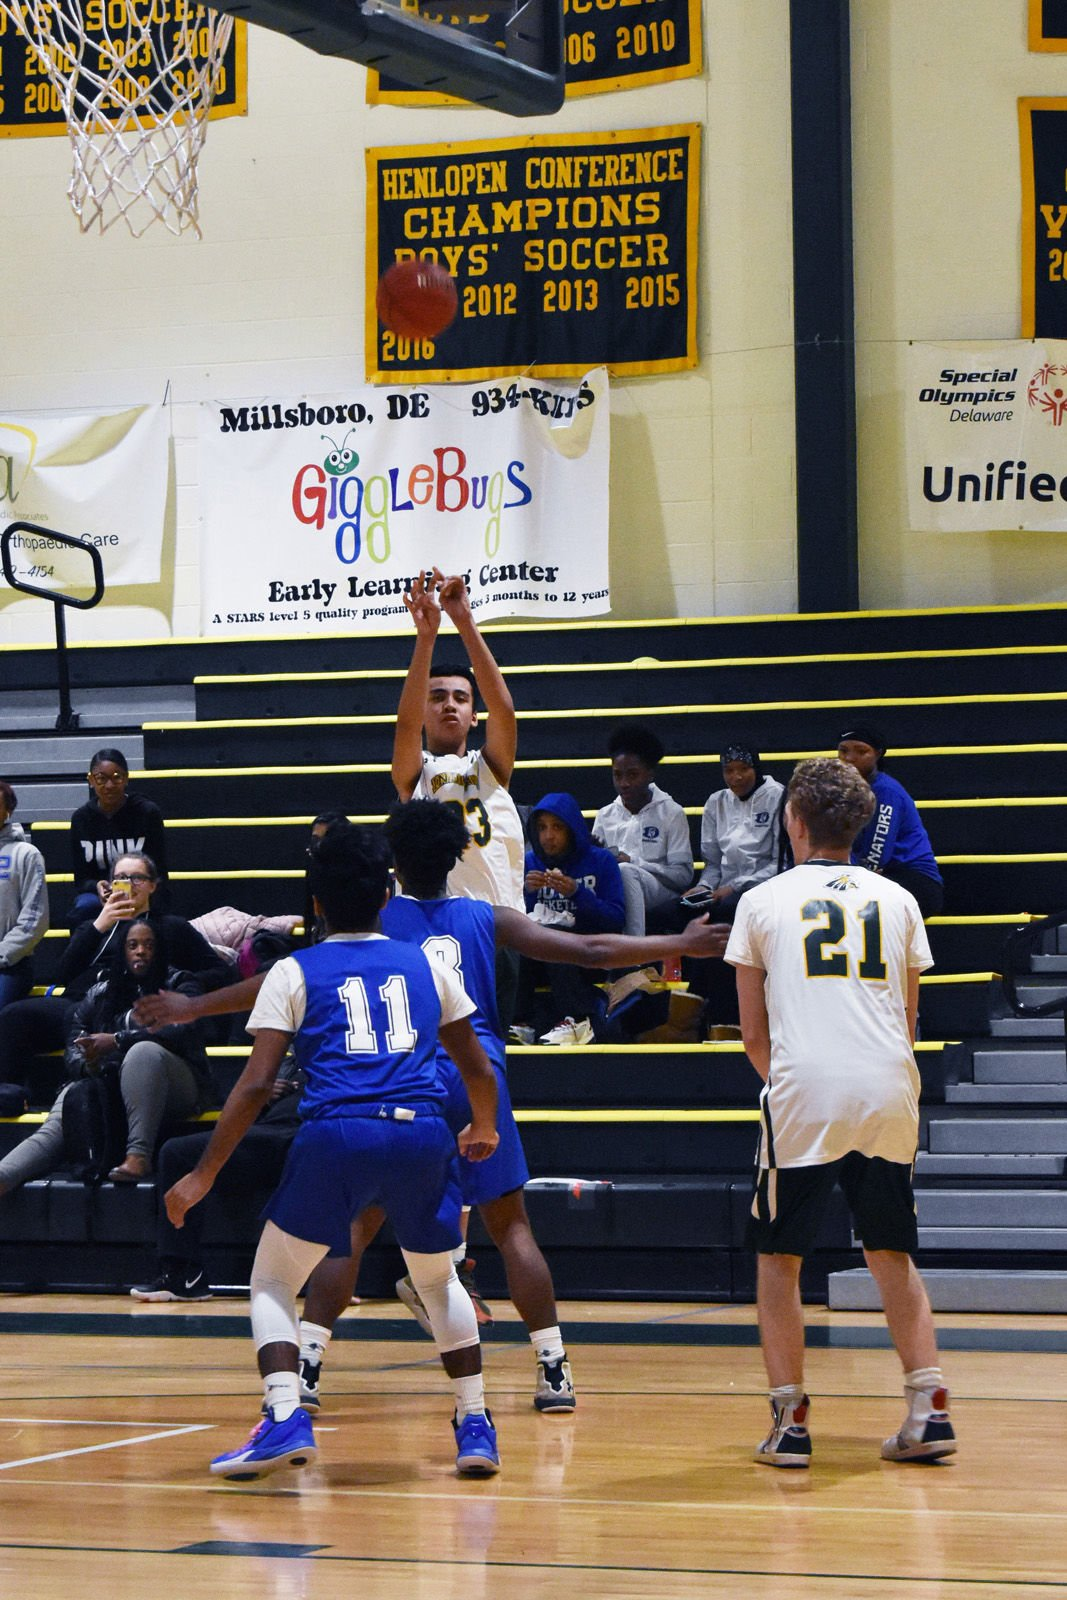 IR's Unified hoops team impressive on the hardwoods